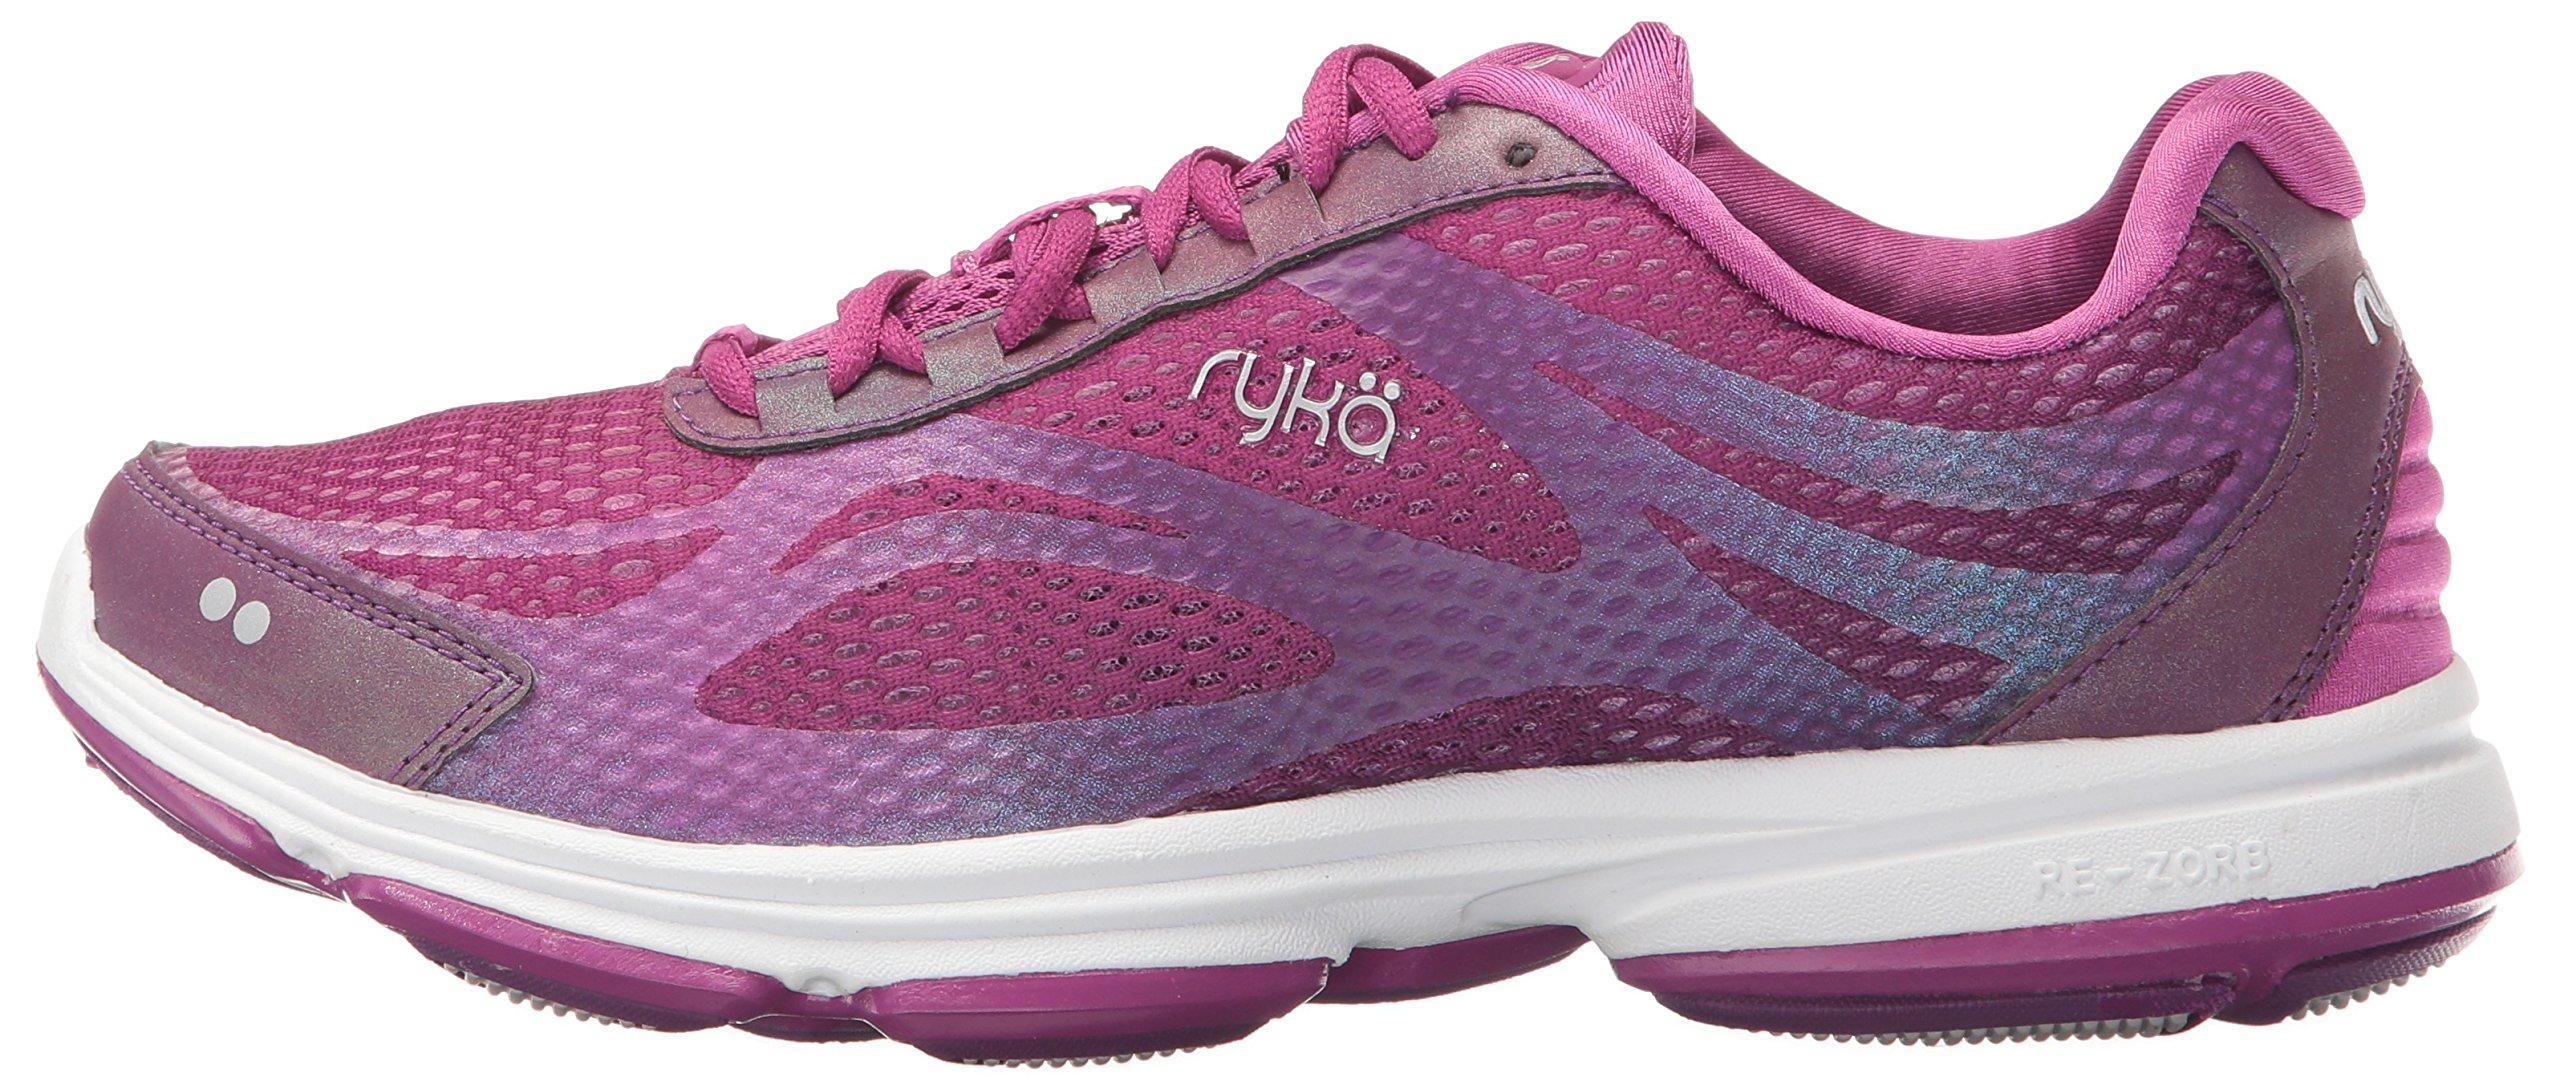 Ryka Women's Devotion Plus 2 Cross Trainer,Grape Juice/Vivid Berry/Chrome Silver by Ryka (Image #5)